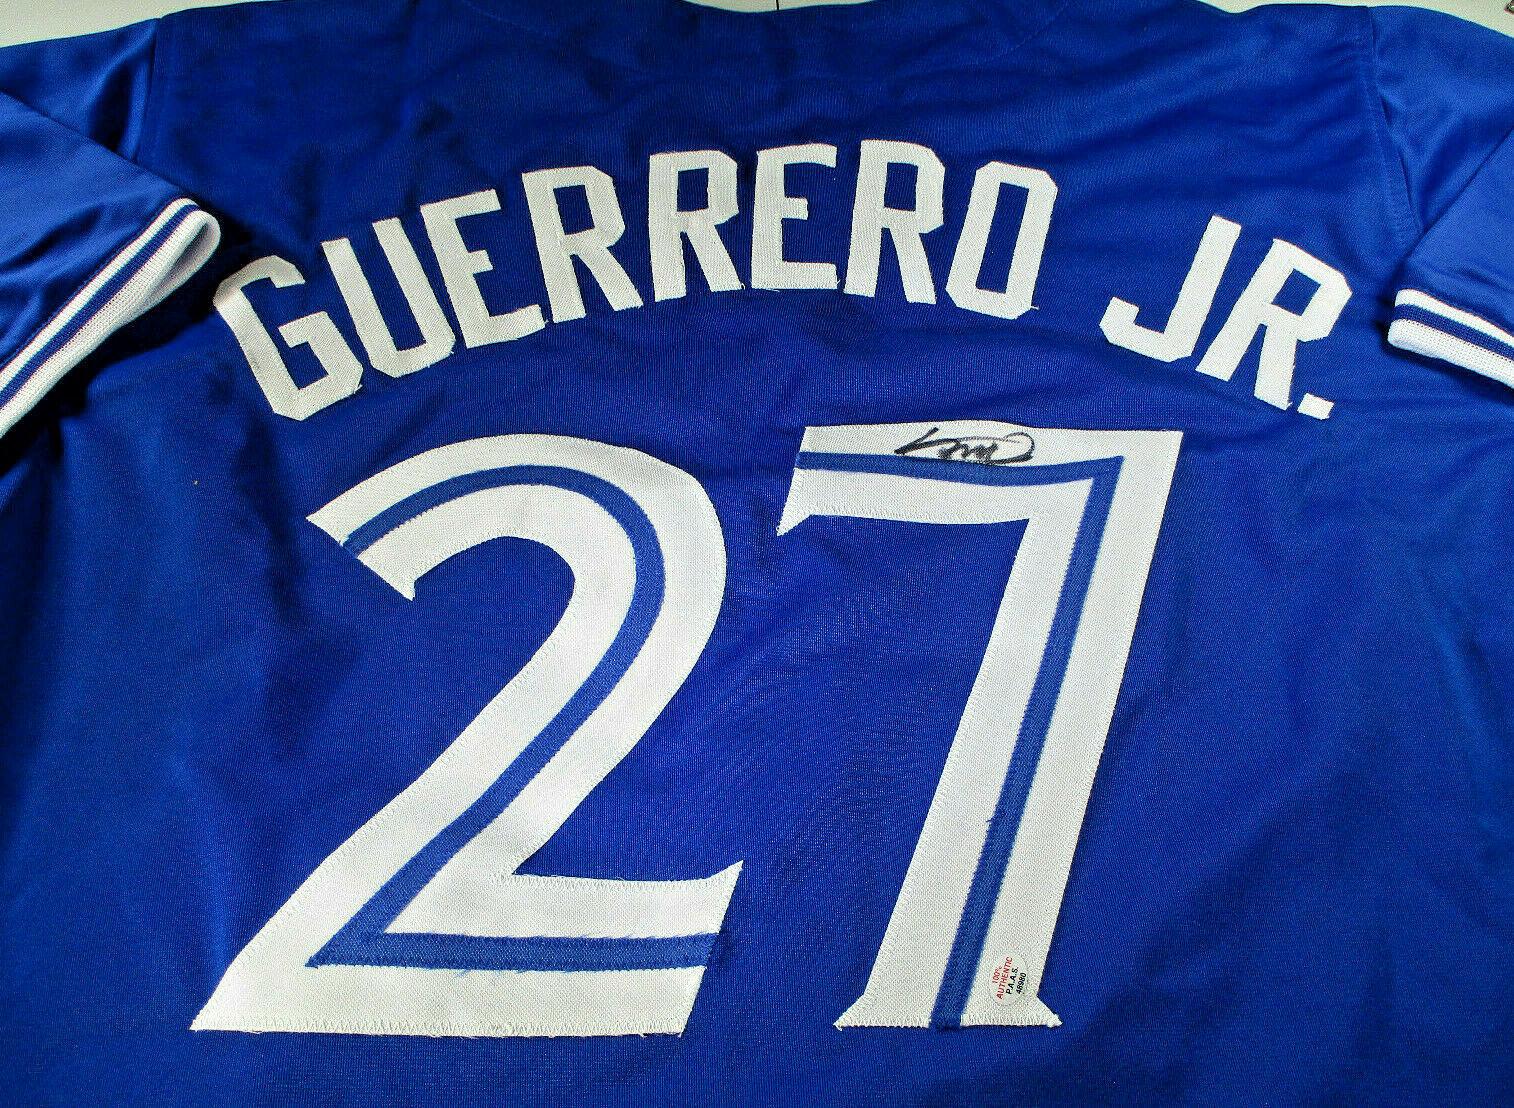 VLADIMIR GUERRERO, JR. / AUTOGRAPHED TORONTO BLUE JAYS CUSTOM JERSEY / COA